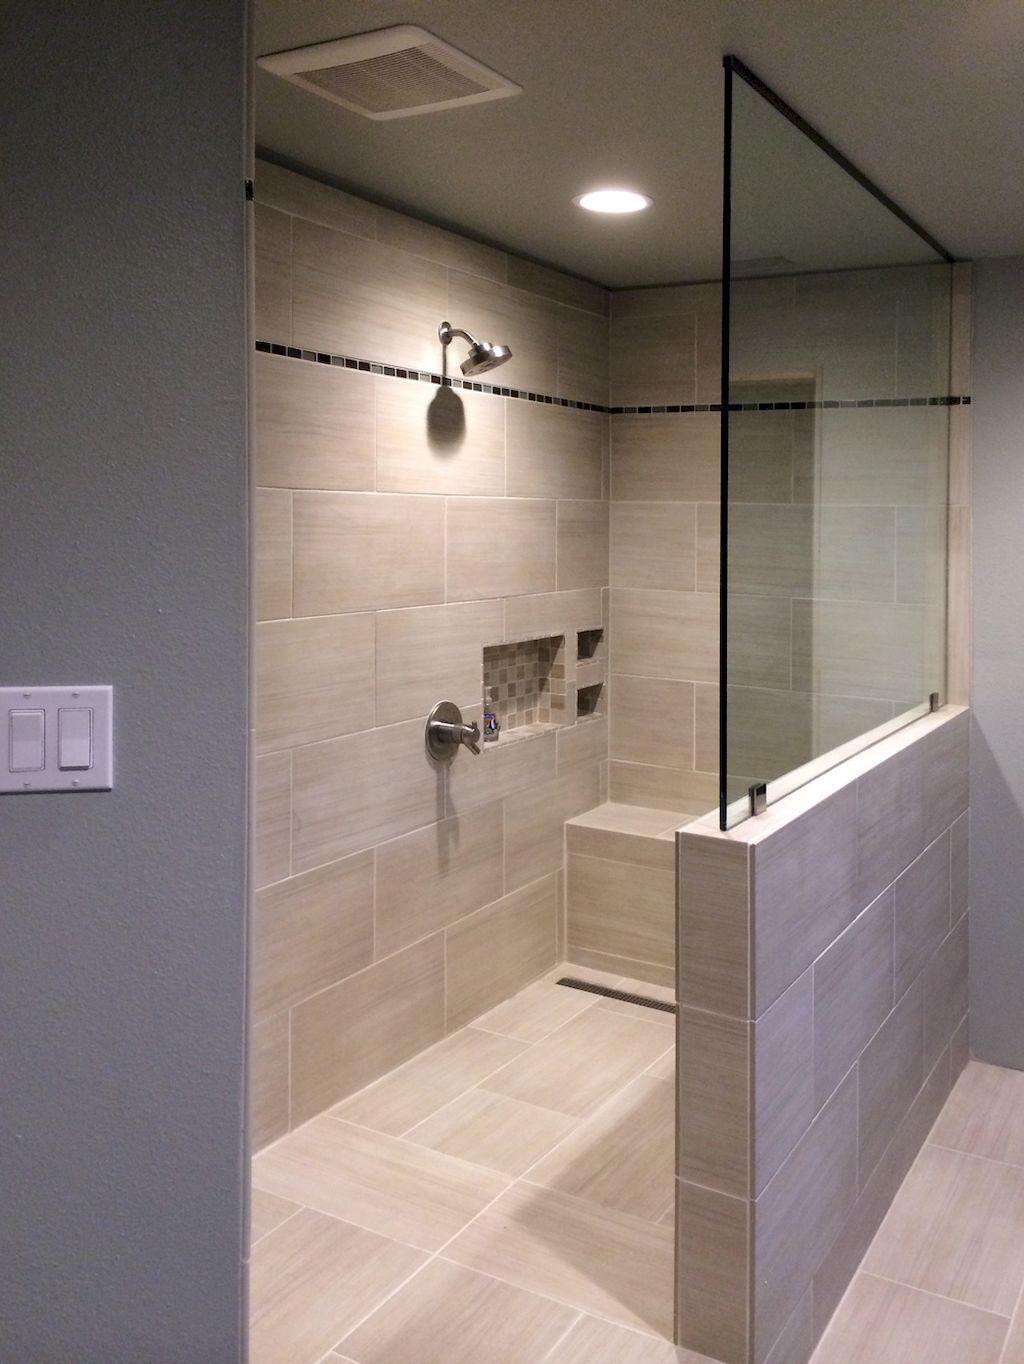 Half muur, half glas voor douche afscheiding | bathroom | Pinterest ...